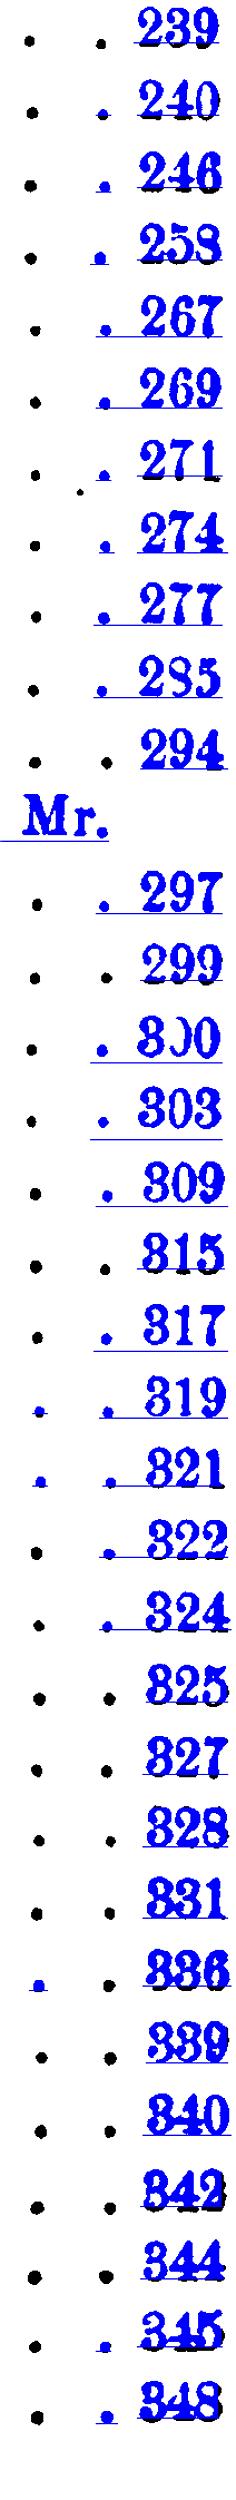 [ocr errors][merged small][merged small][merged small][merged small][merged small][merged small][ocr errors][ocr errors][ocr errors][ocr errors][ocr errors][ocr errors][ocr errors][ocr errors][ocr errors][ocr errors]